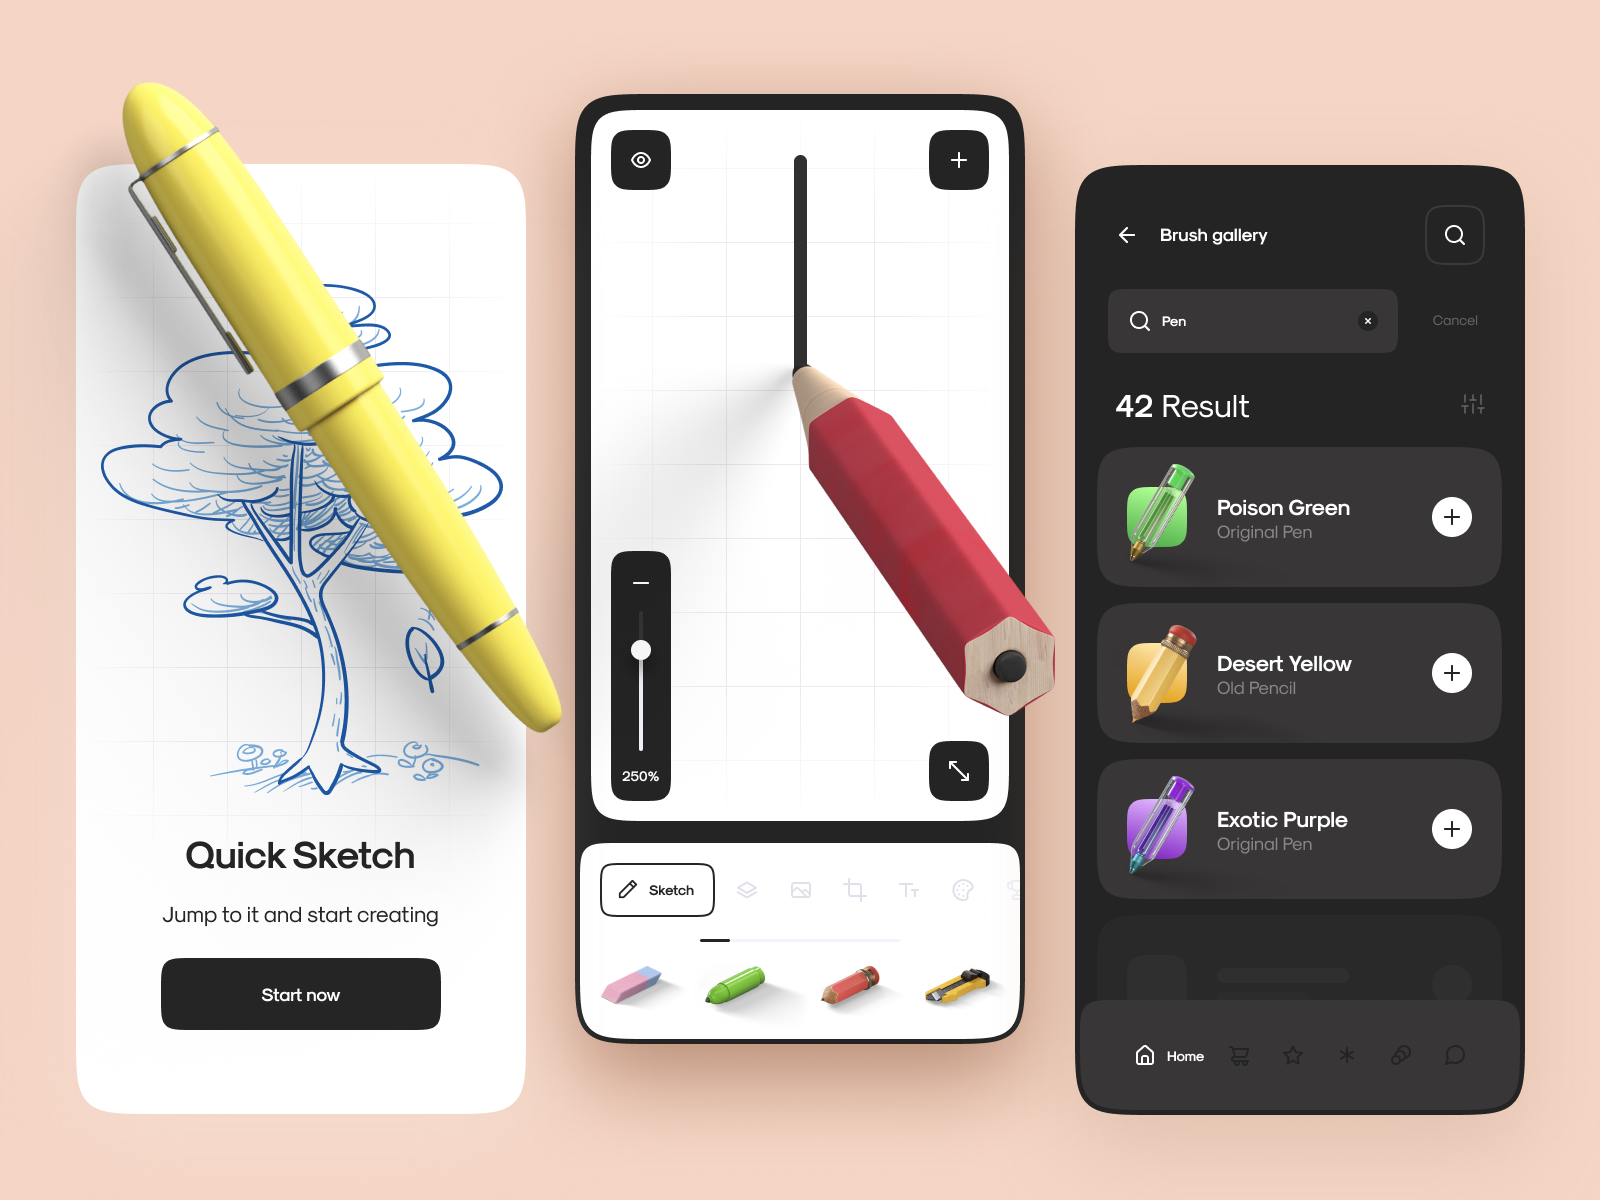 Smart Sketch App Interaction by Atuka for UBANI